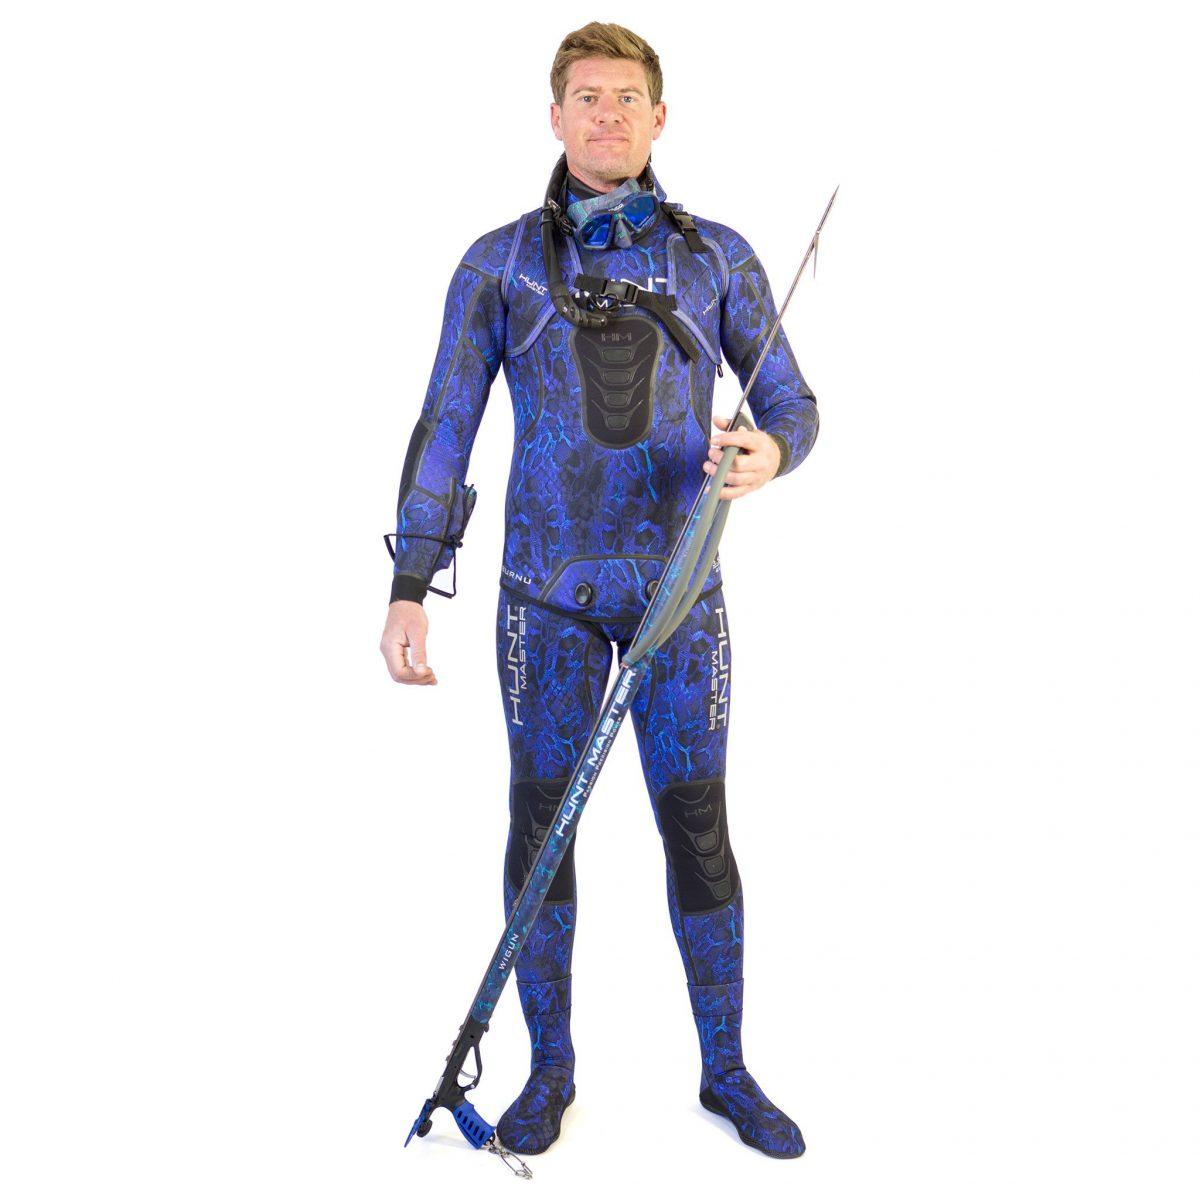 Huntsman Wetsuit Camo 1.5mm- 2 Piece - Long John Pant & Hooded Top